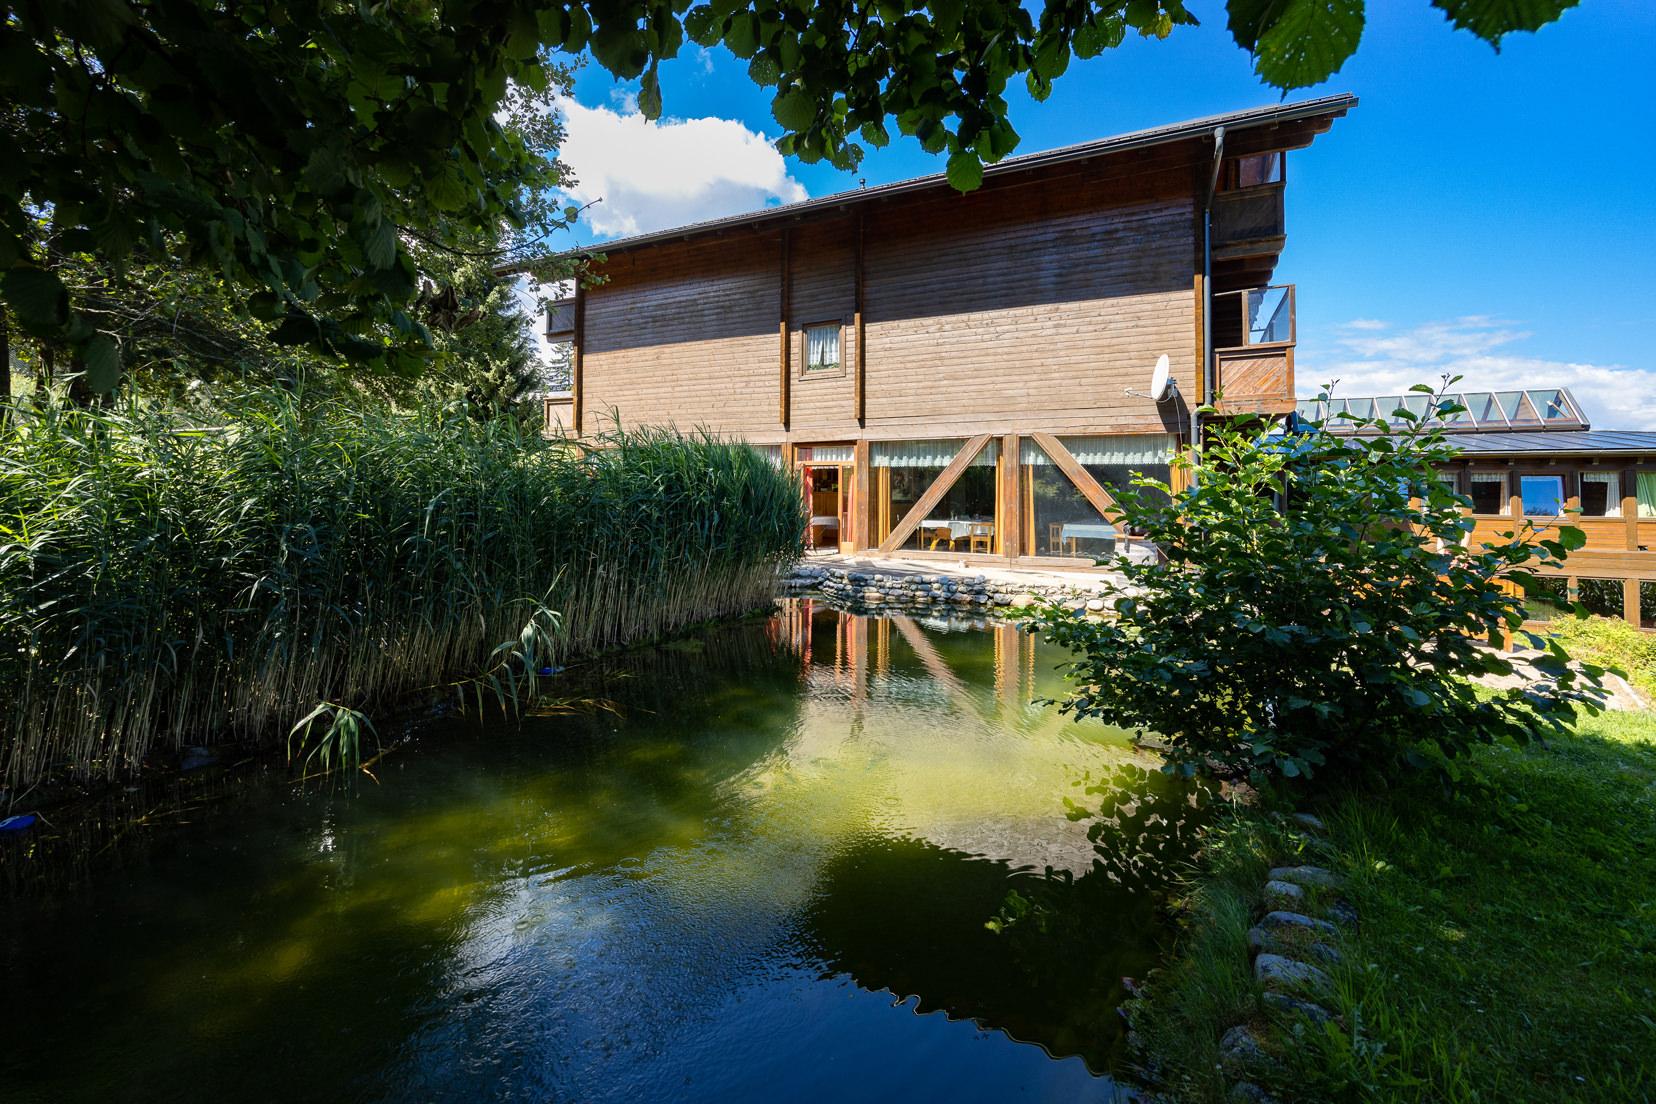 Herrlicher Panoramablick vom Naturhotel Enzianhof | © Naturhotel Enzianhof